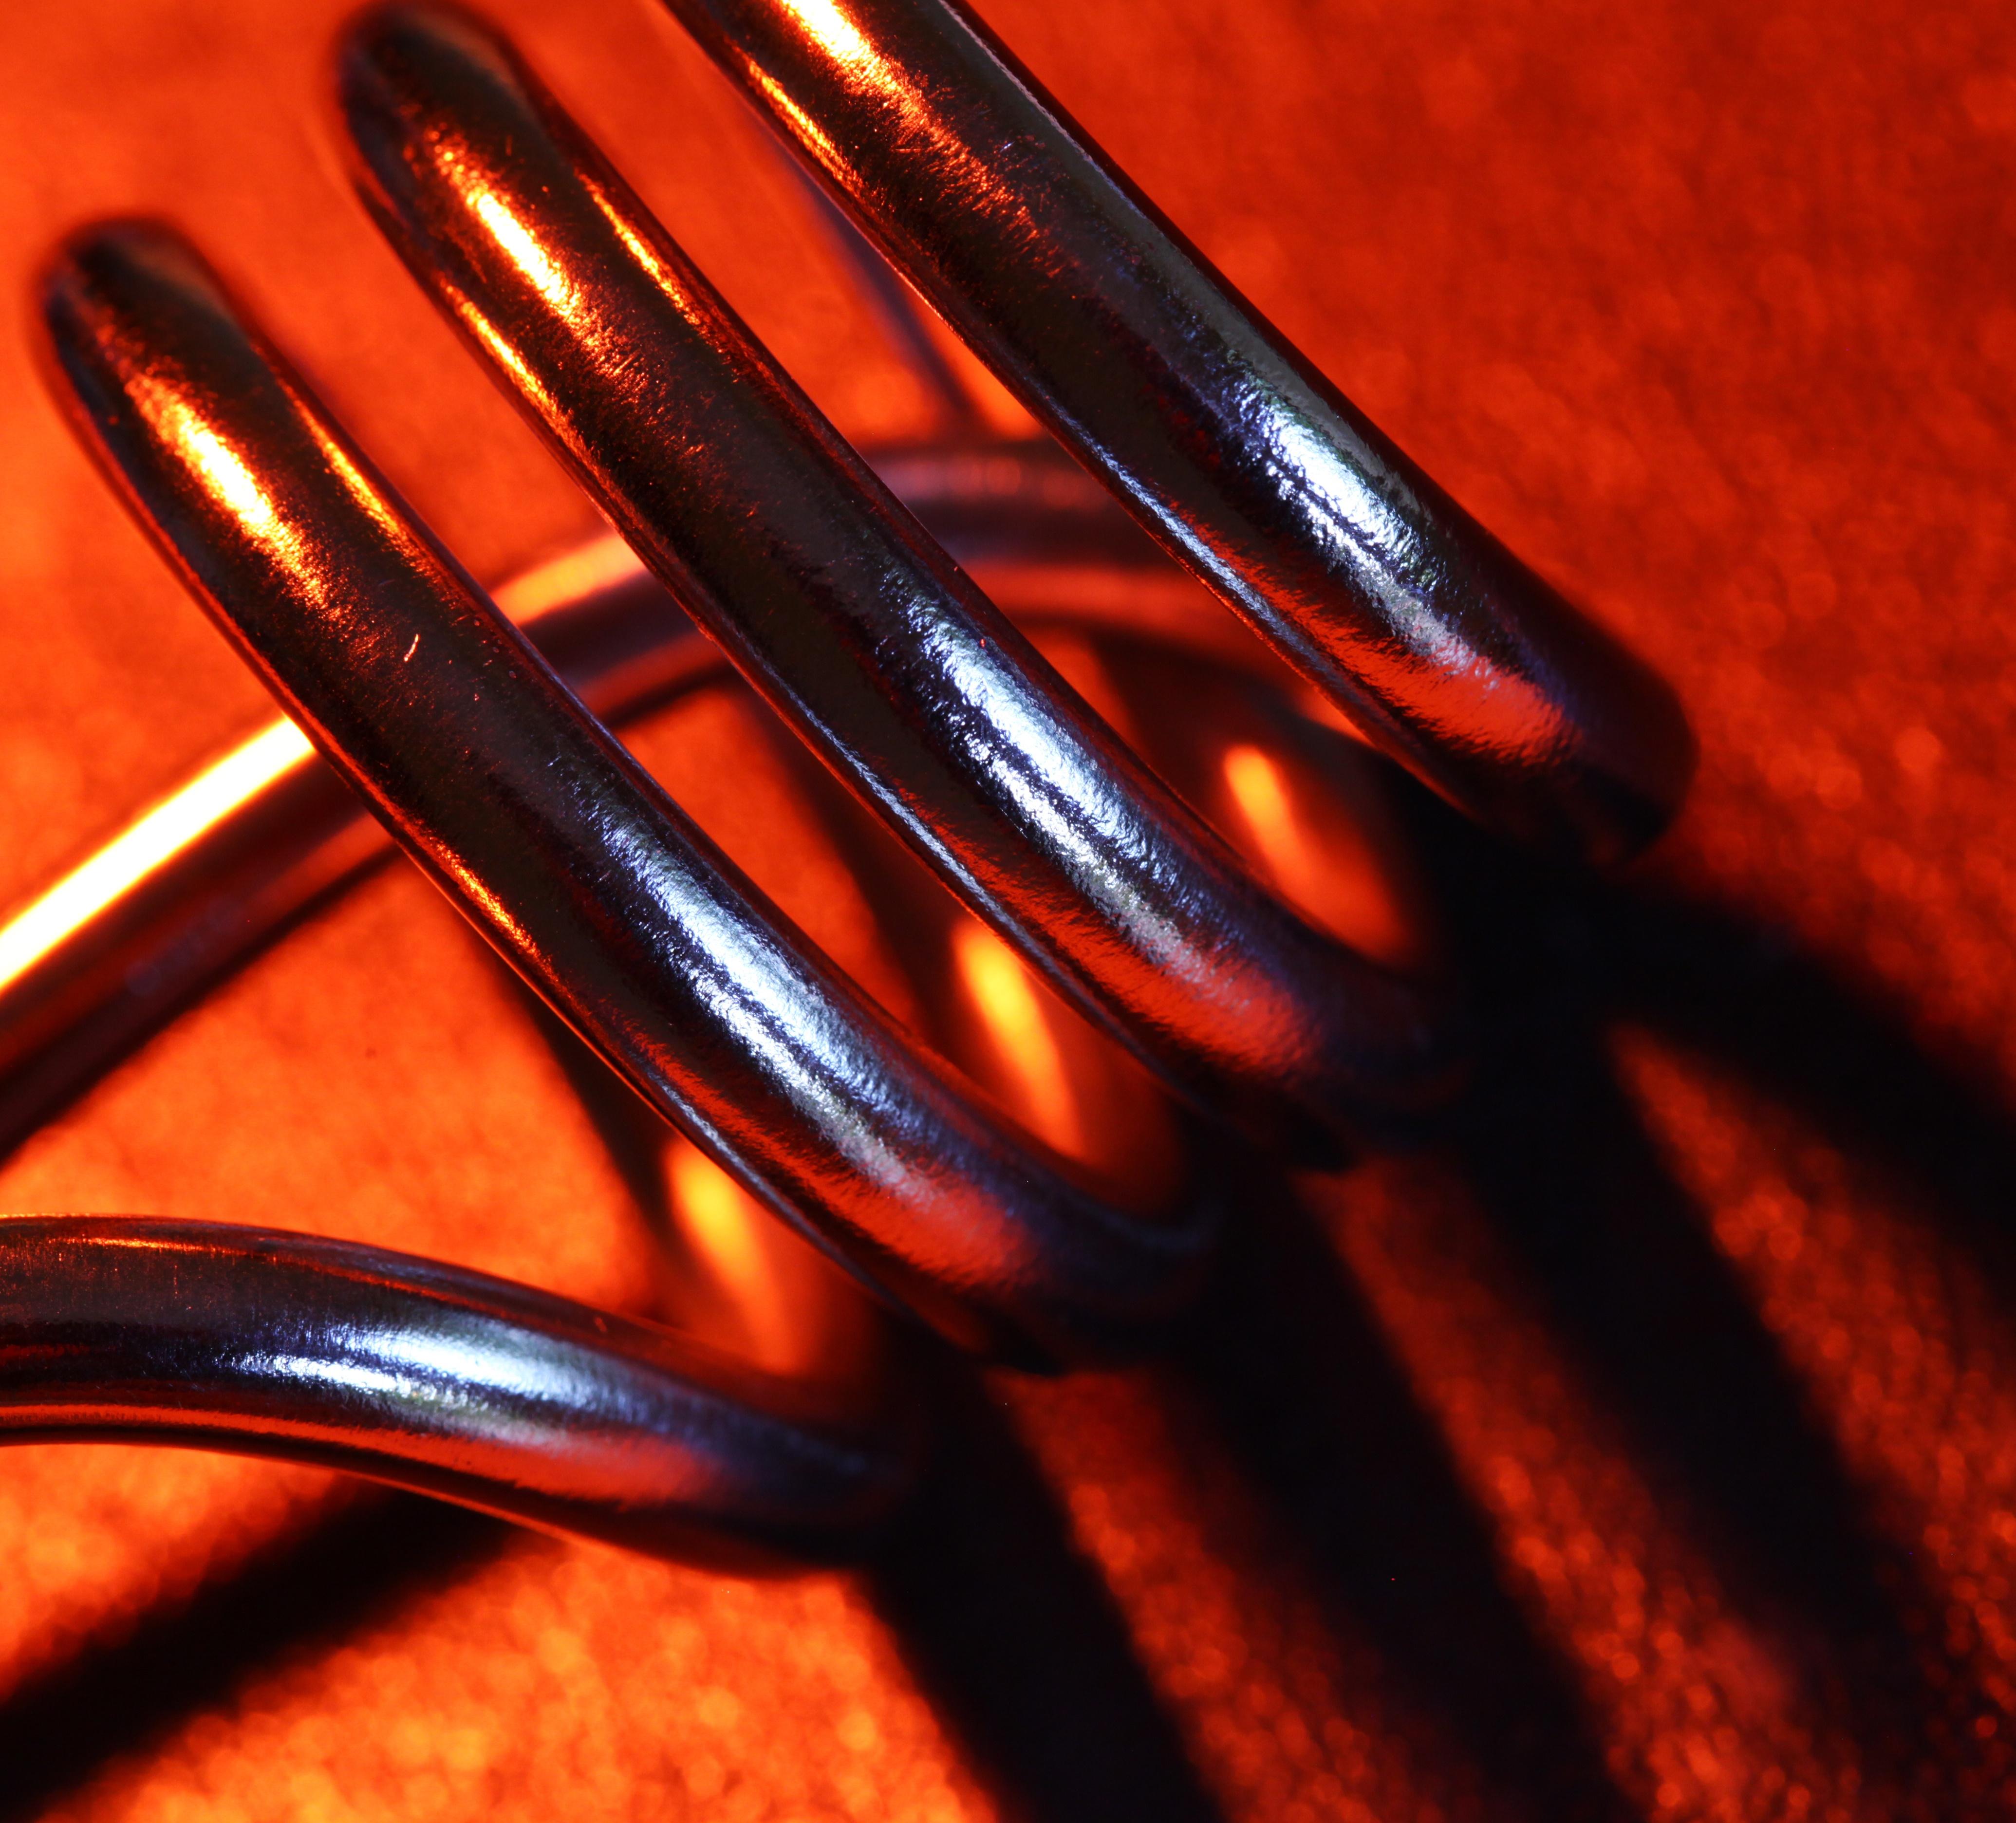 bigstock-Heating-Coil-59233805.jpg